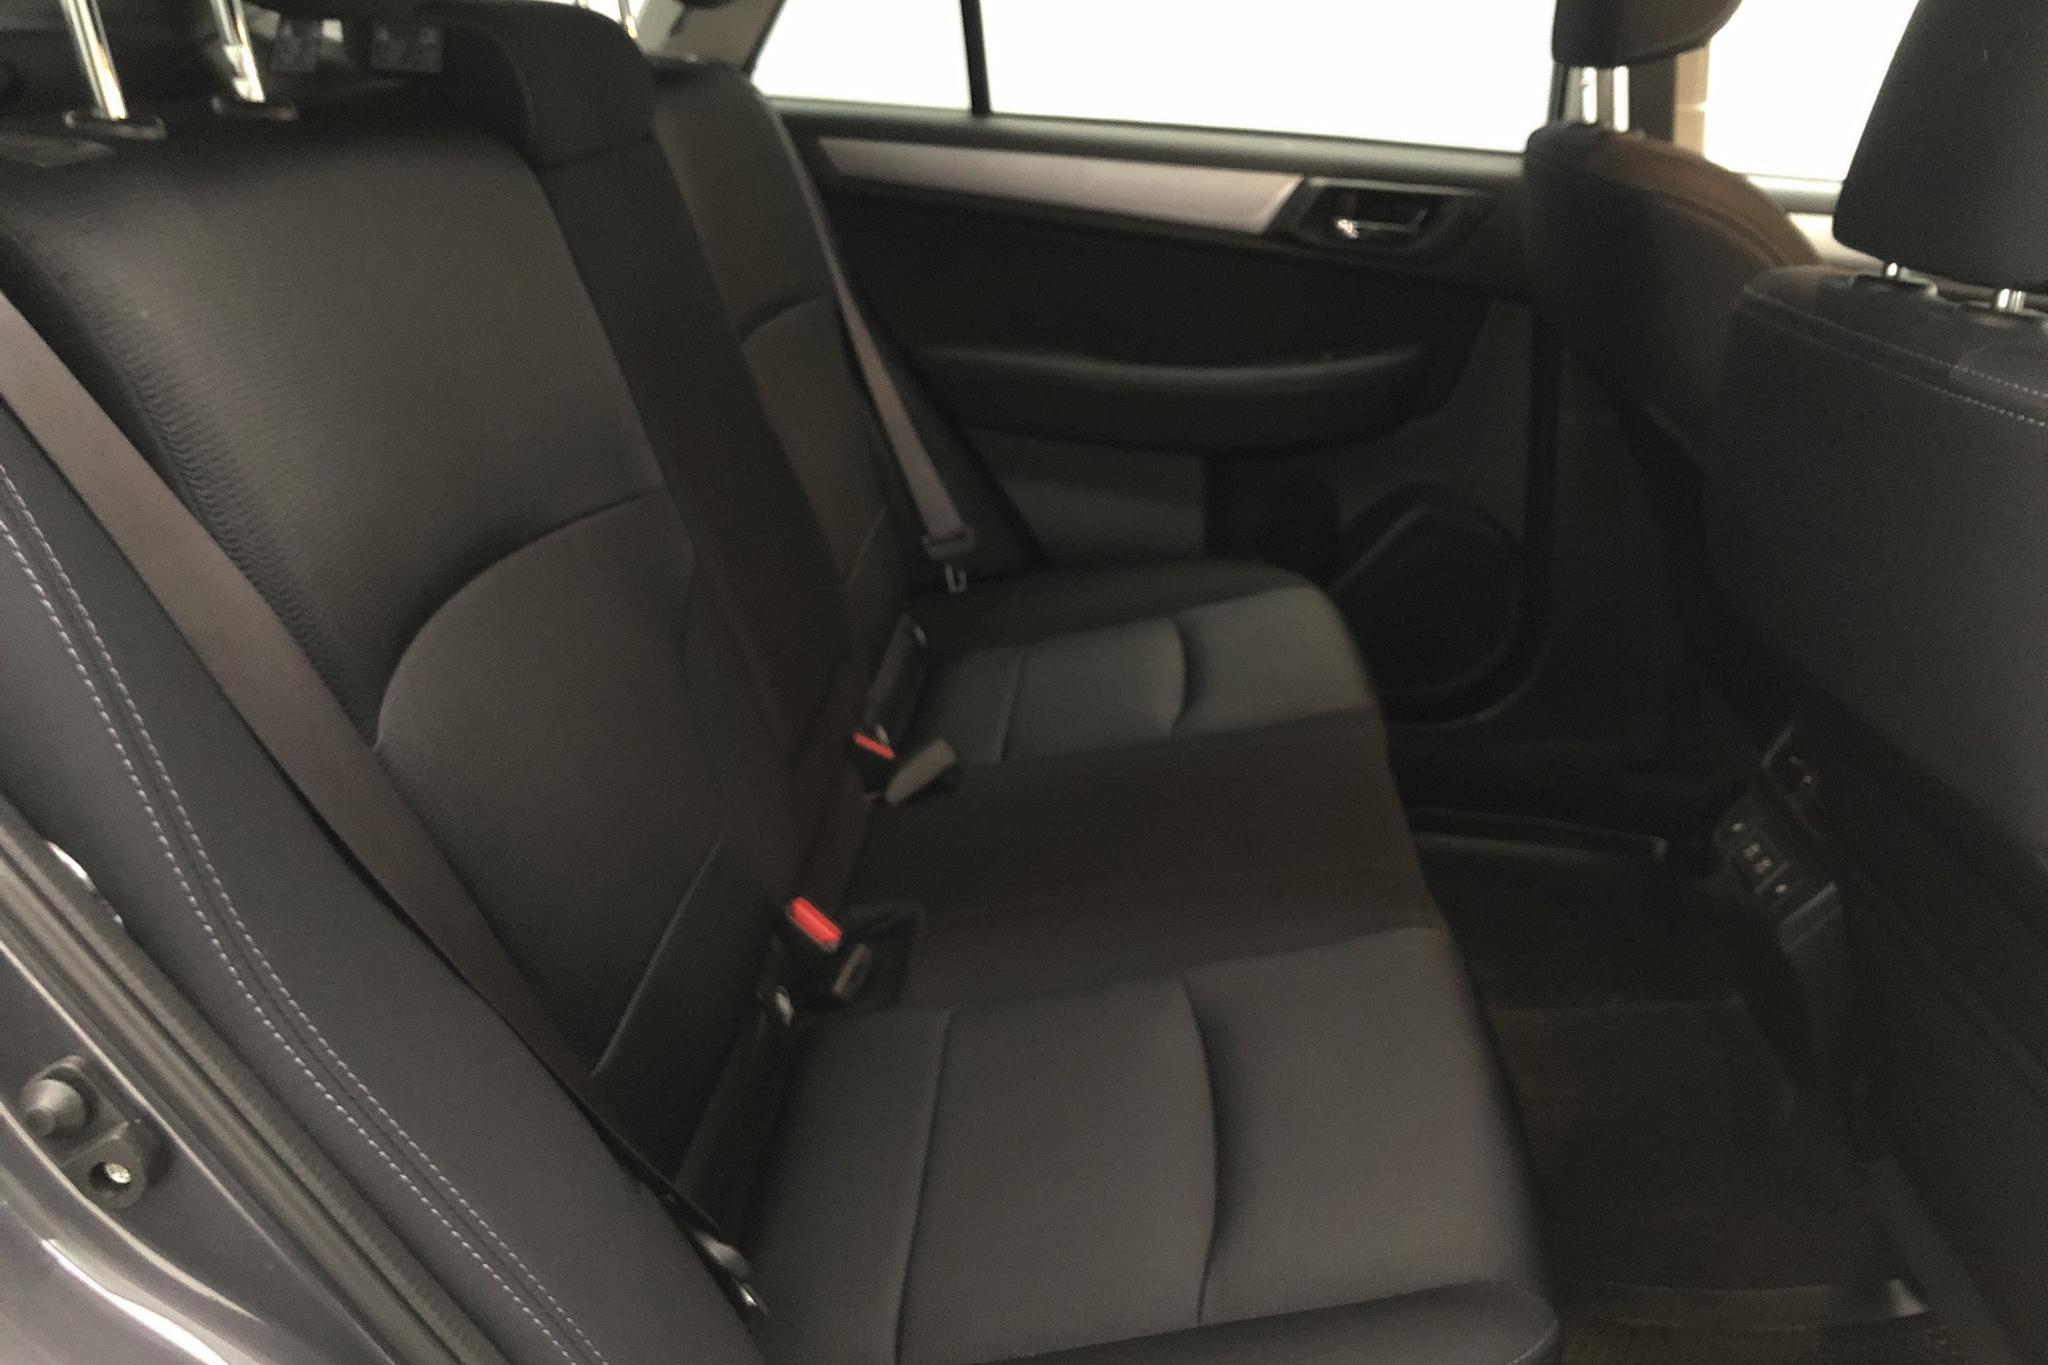 Subaru Outback 2.5i 4WD (173hk) - 23 640 km - Automatic - gray - 2019